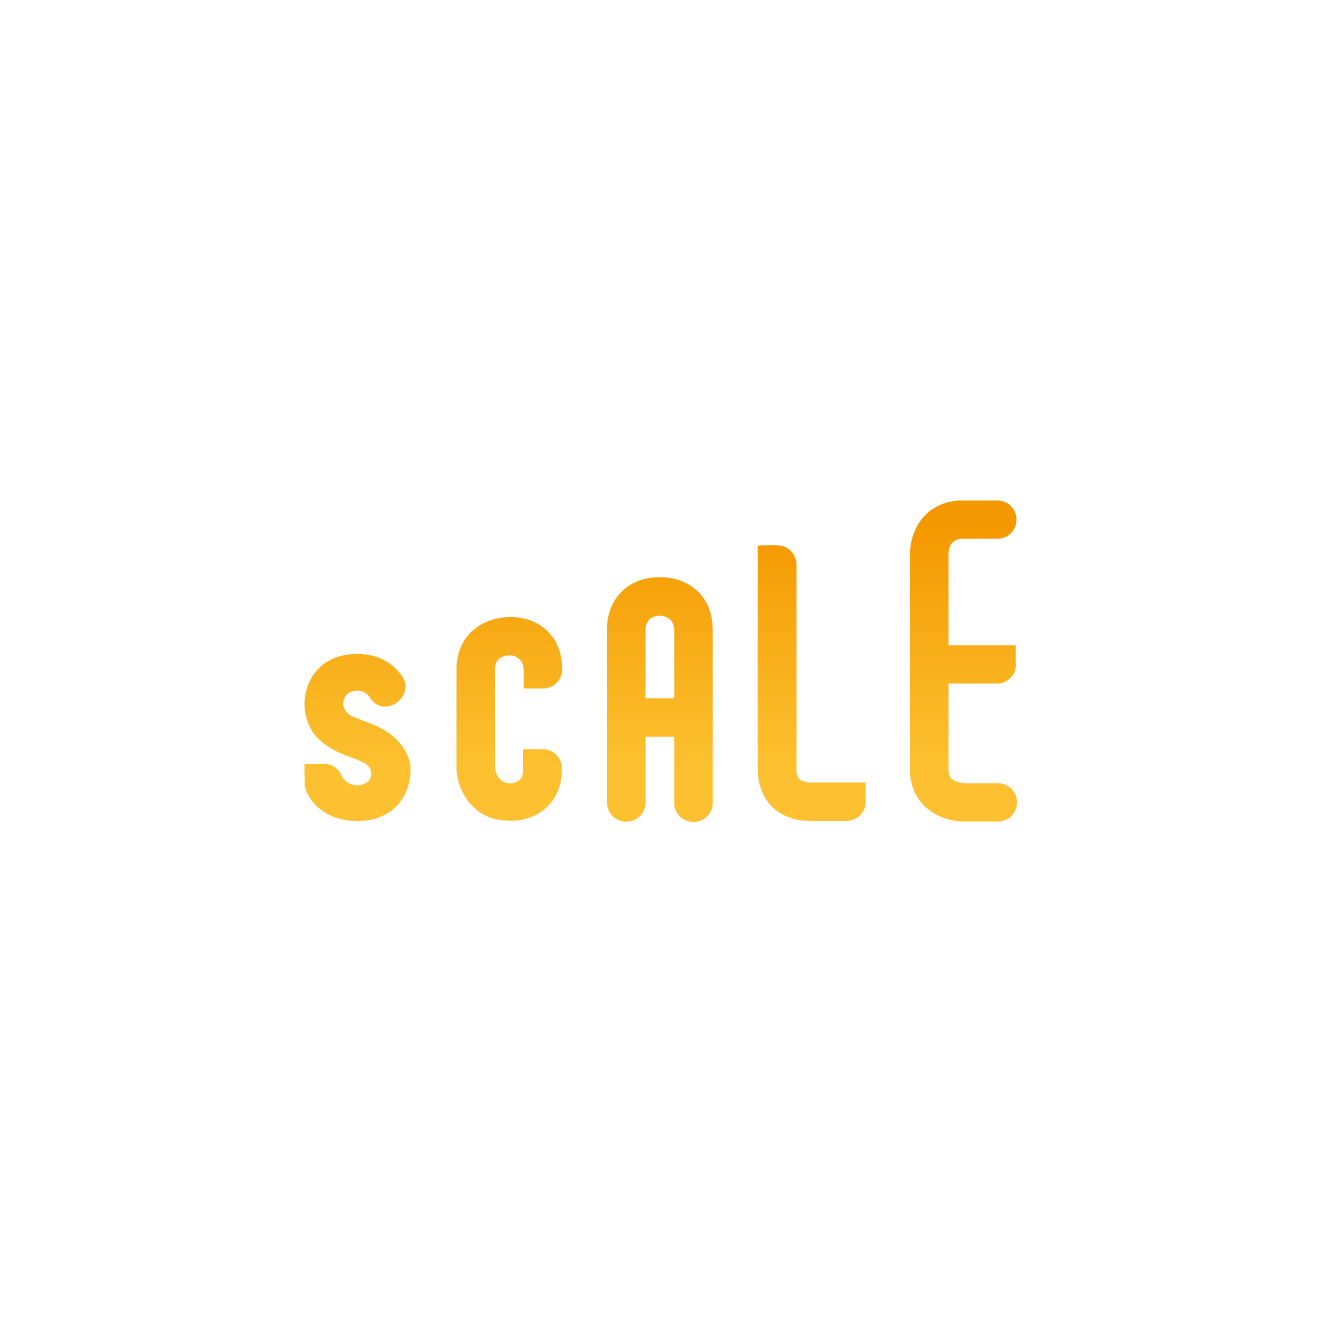 Scale Identity